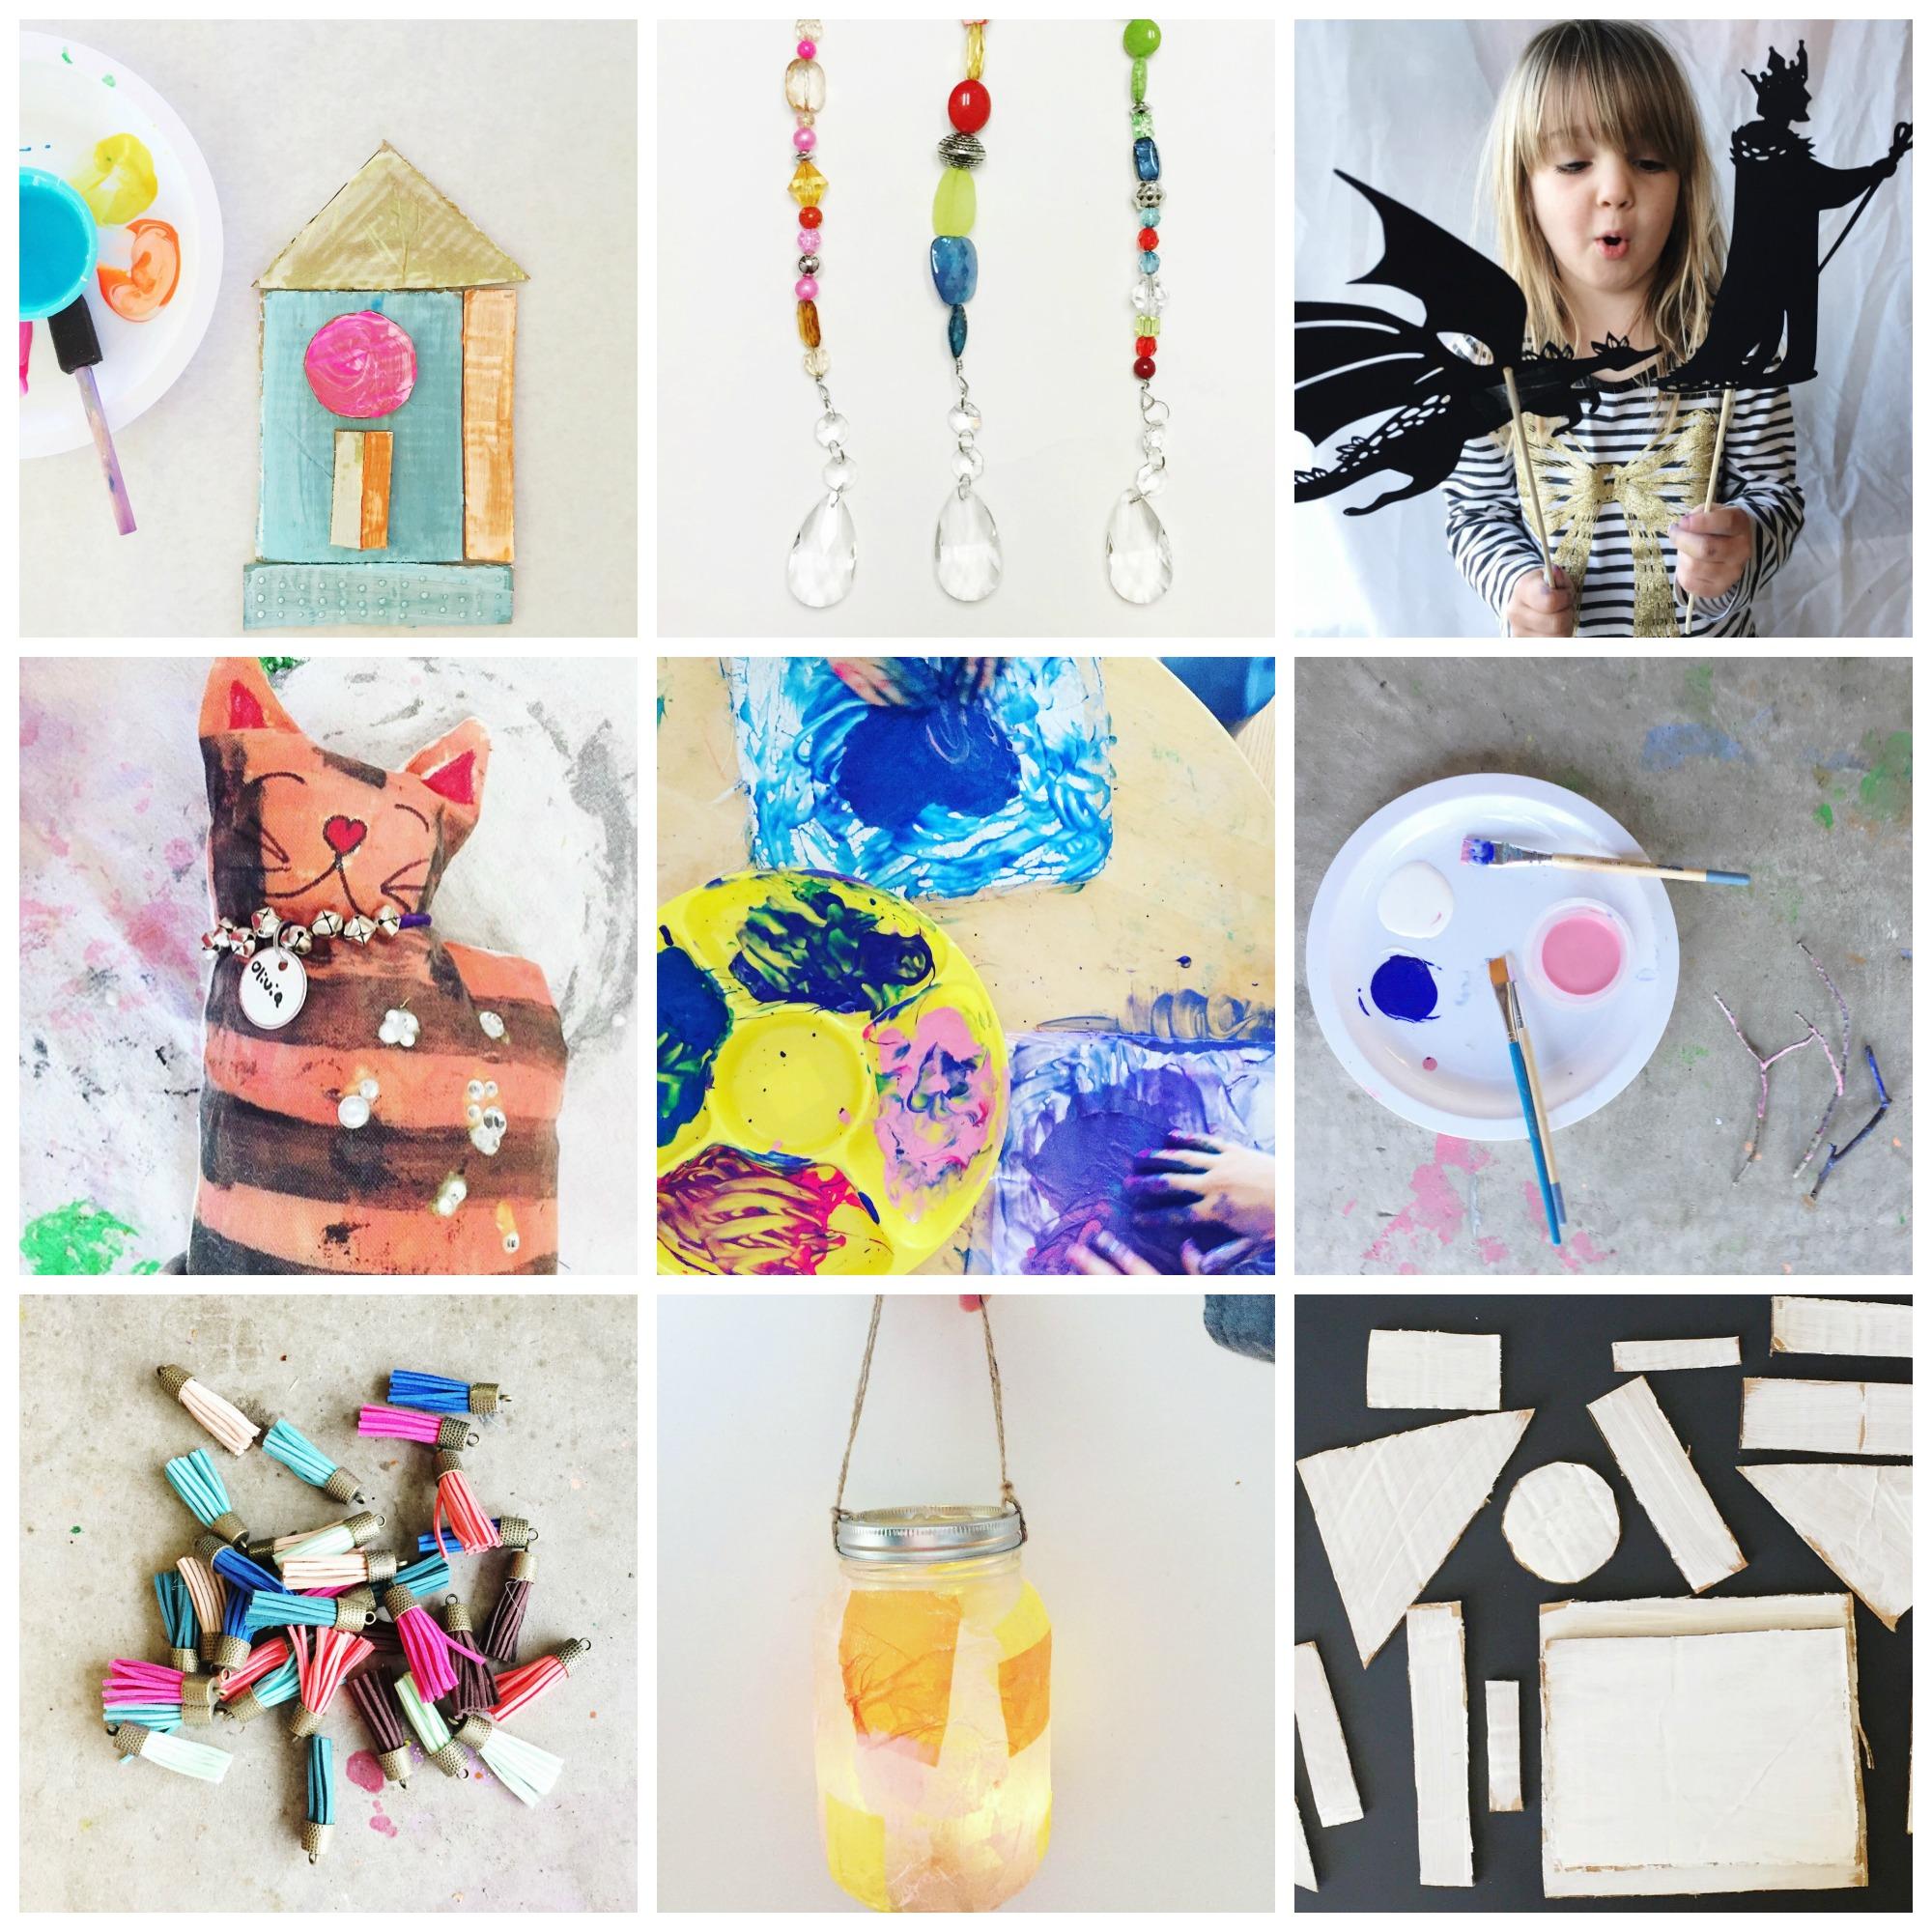 blog collage 2016.jpg